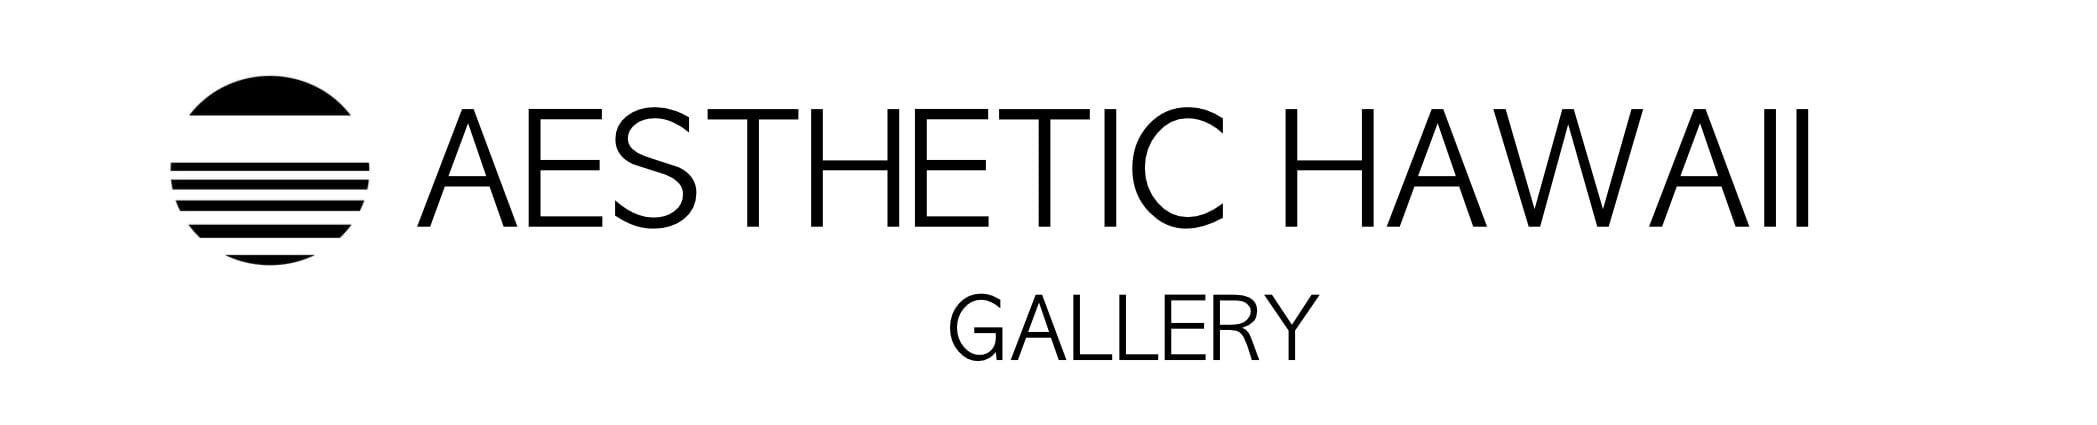 Aesthetic Hawaii Gallery Logo